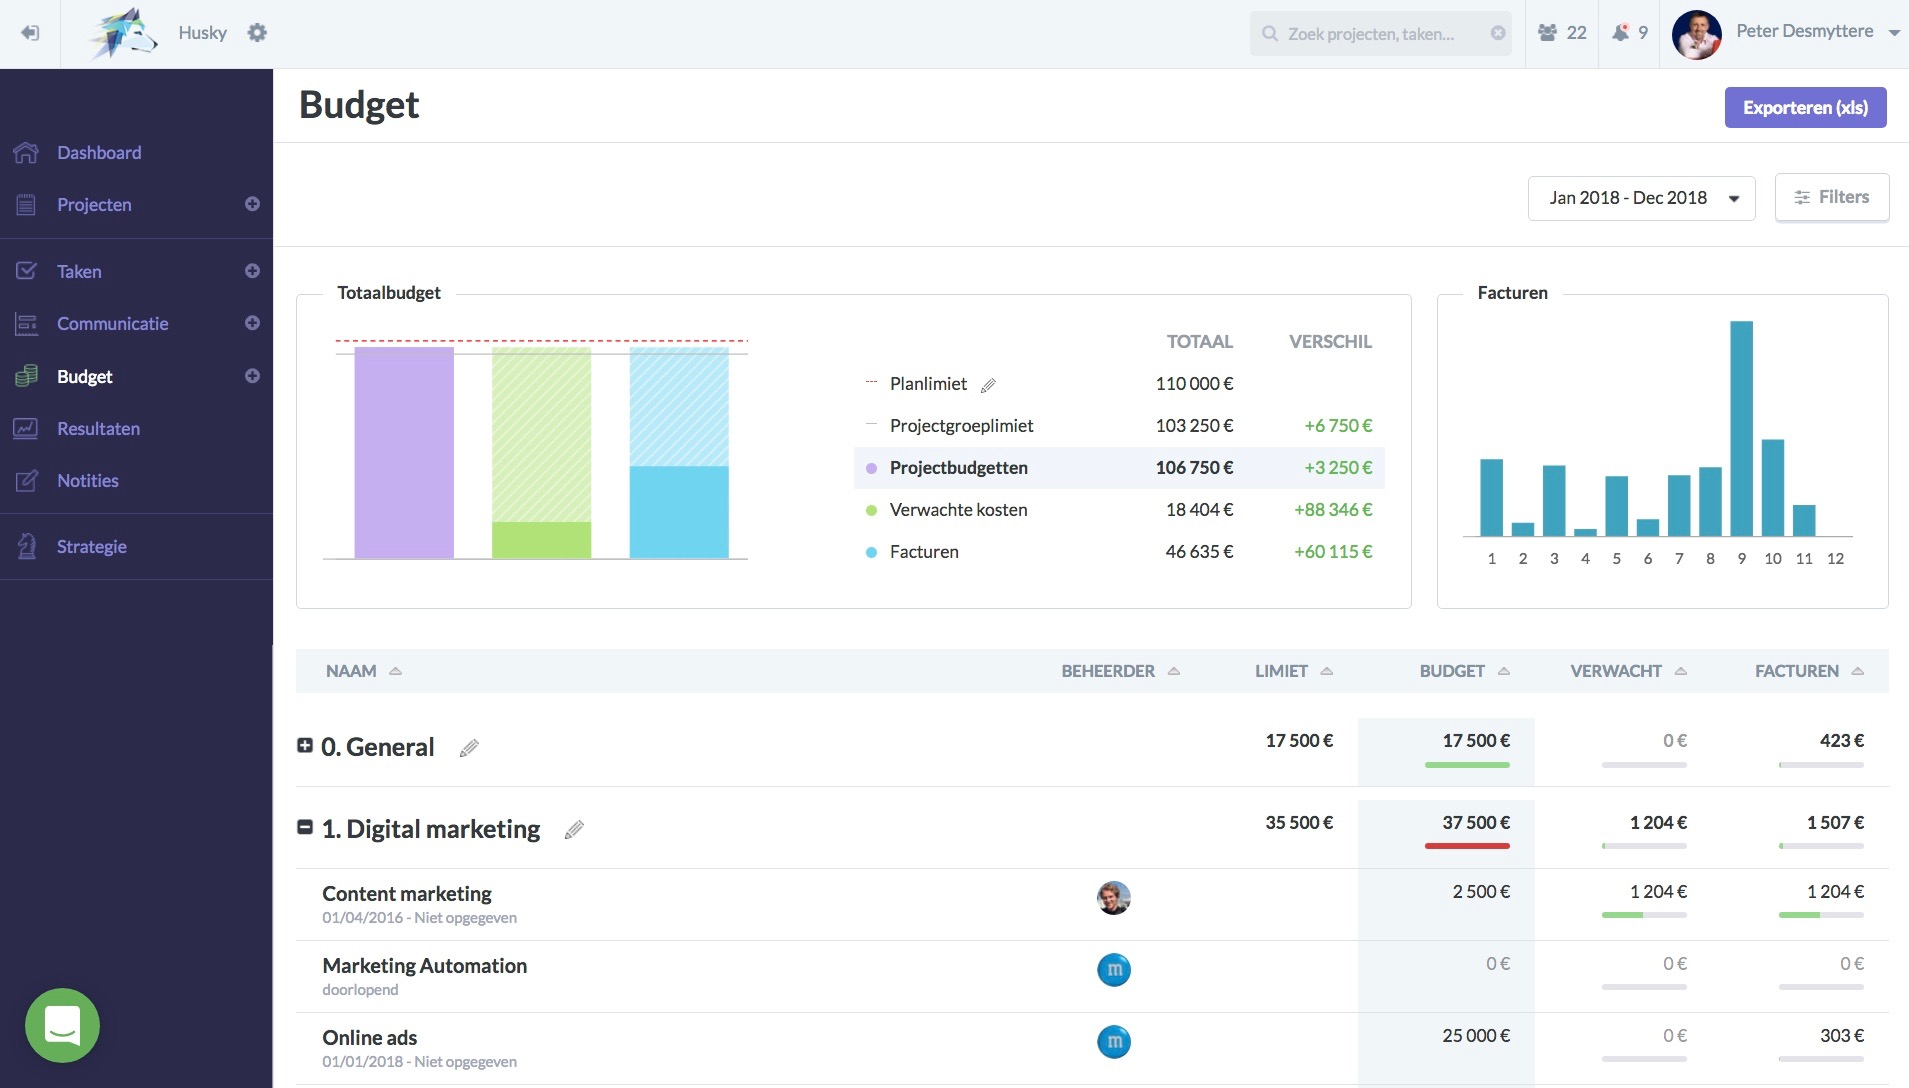 Budgetplan b2b marketing